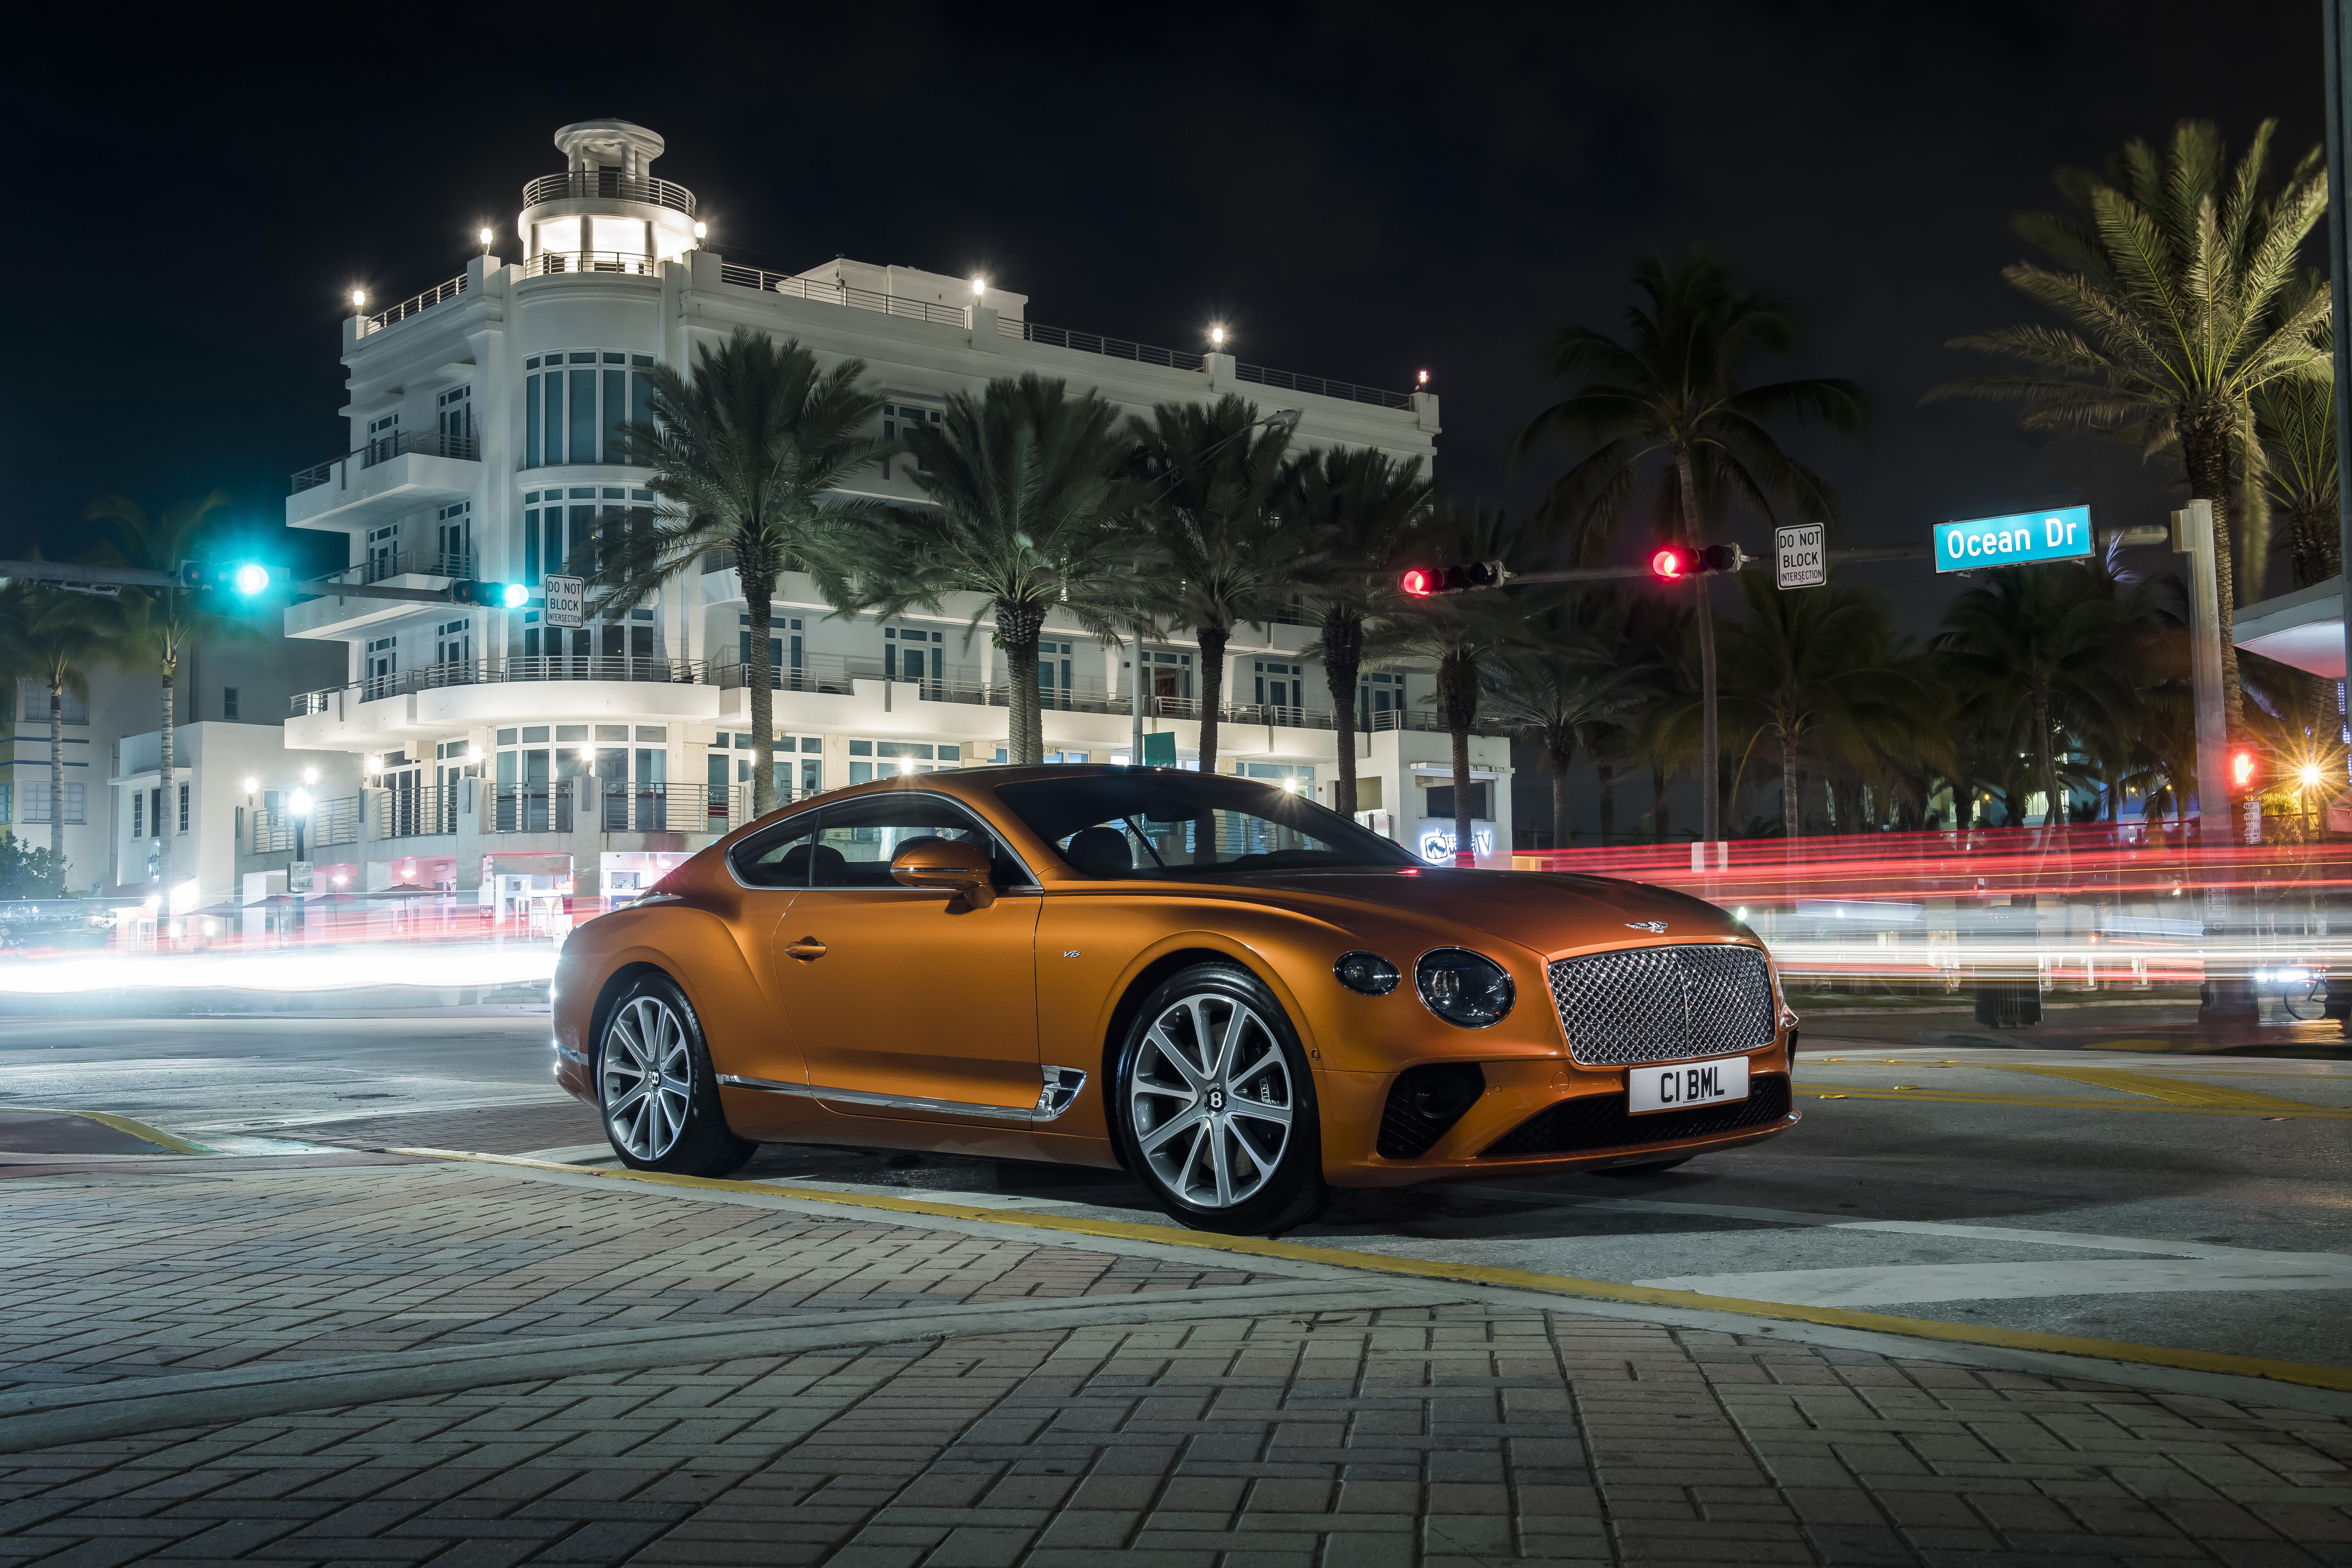 2019 Bentley Continental GT V8 8k, HD Cars, 4k Wallpapers ...